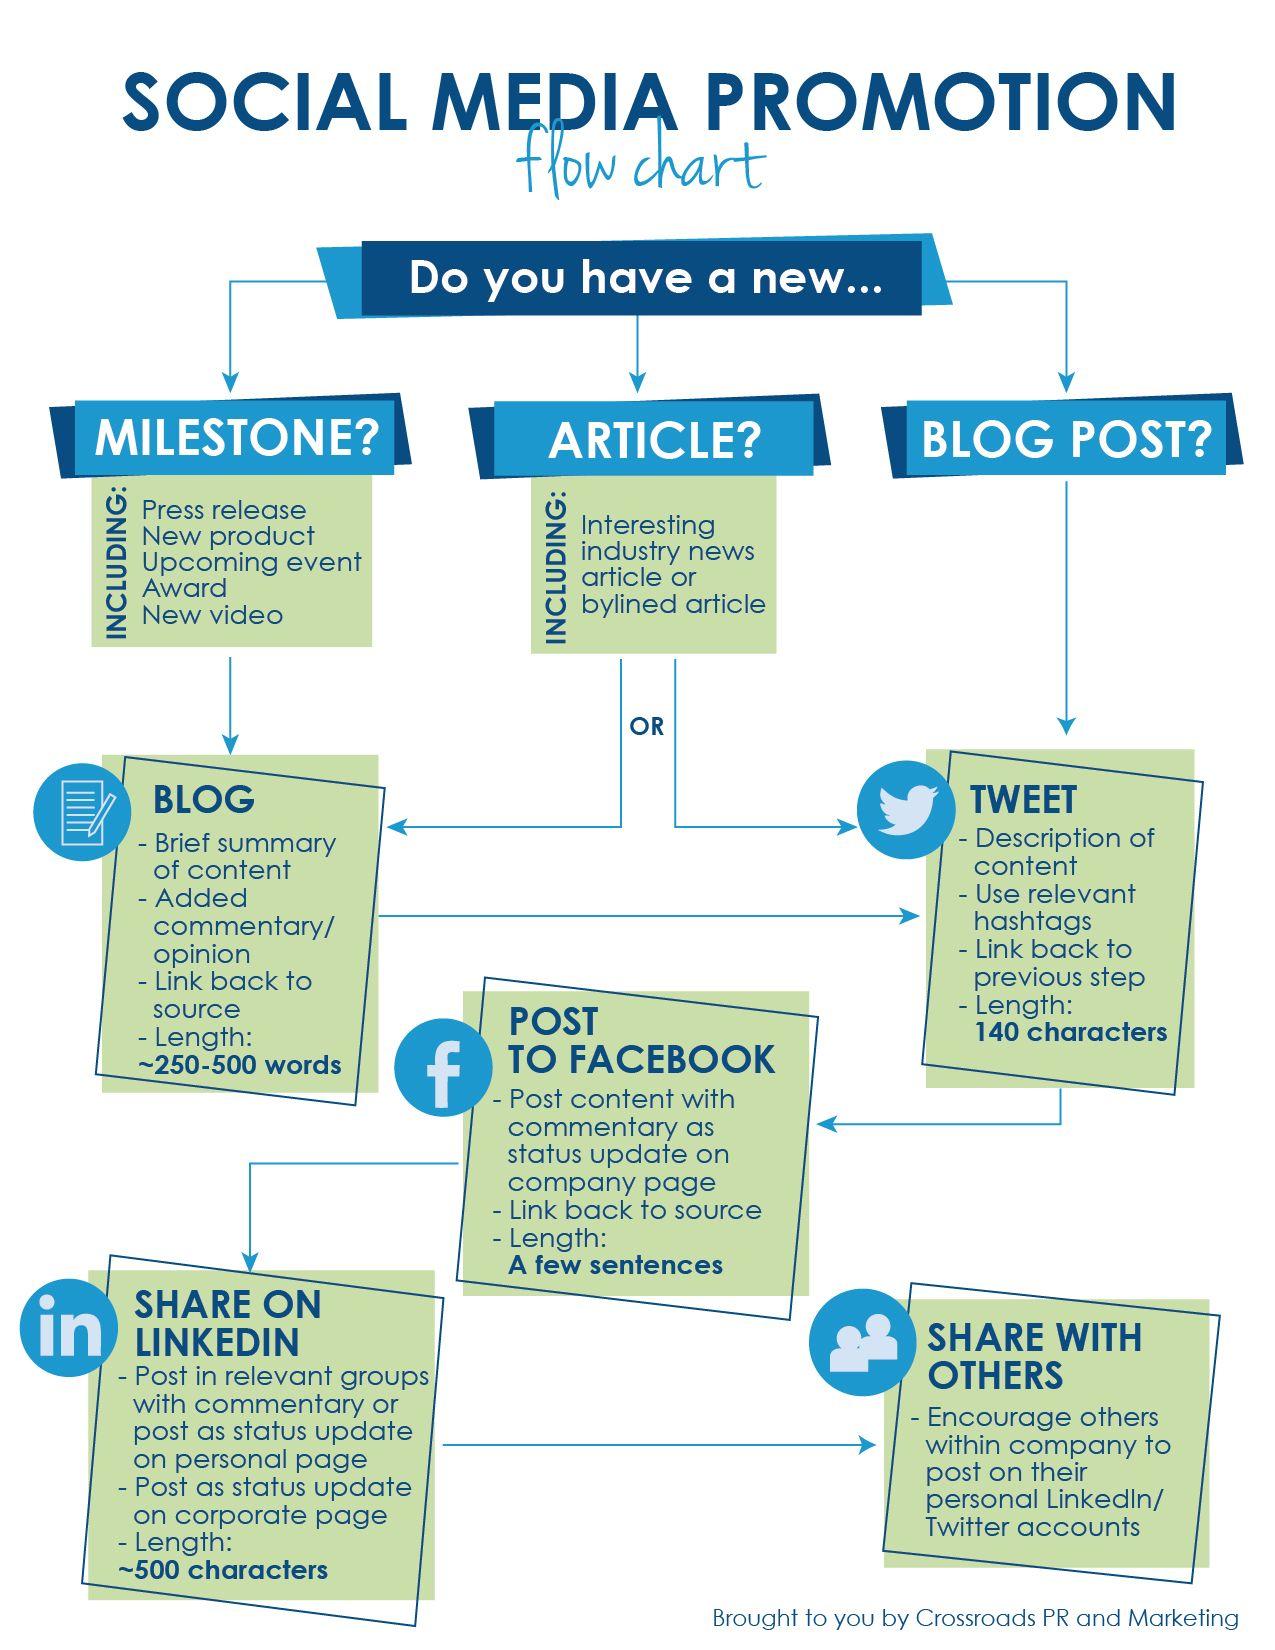 social media promotion | Social Media Tools and Strategies ...